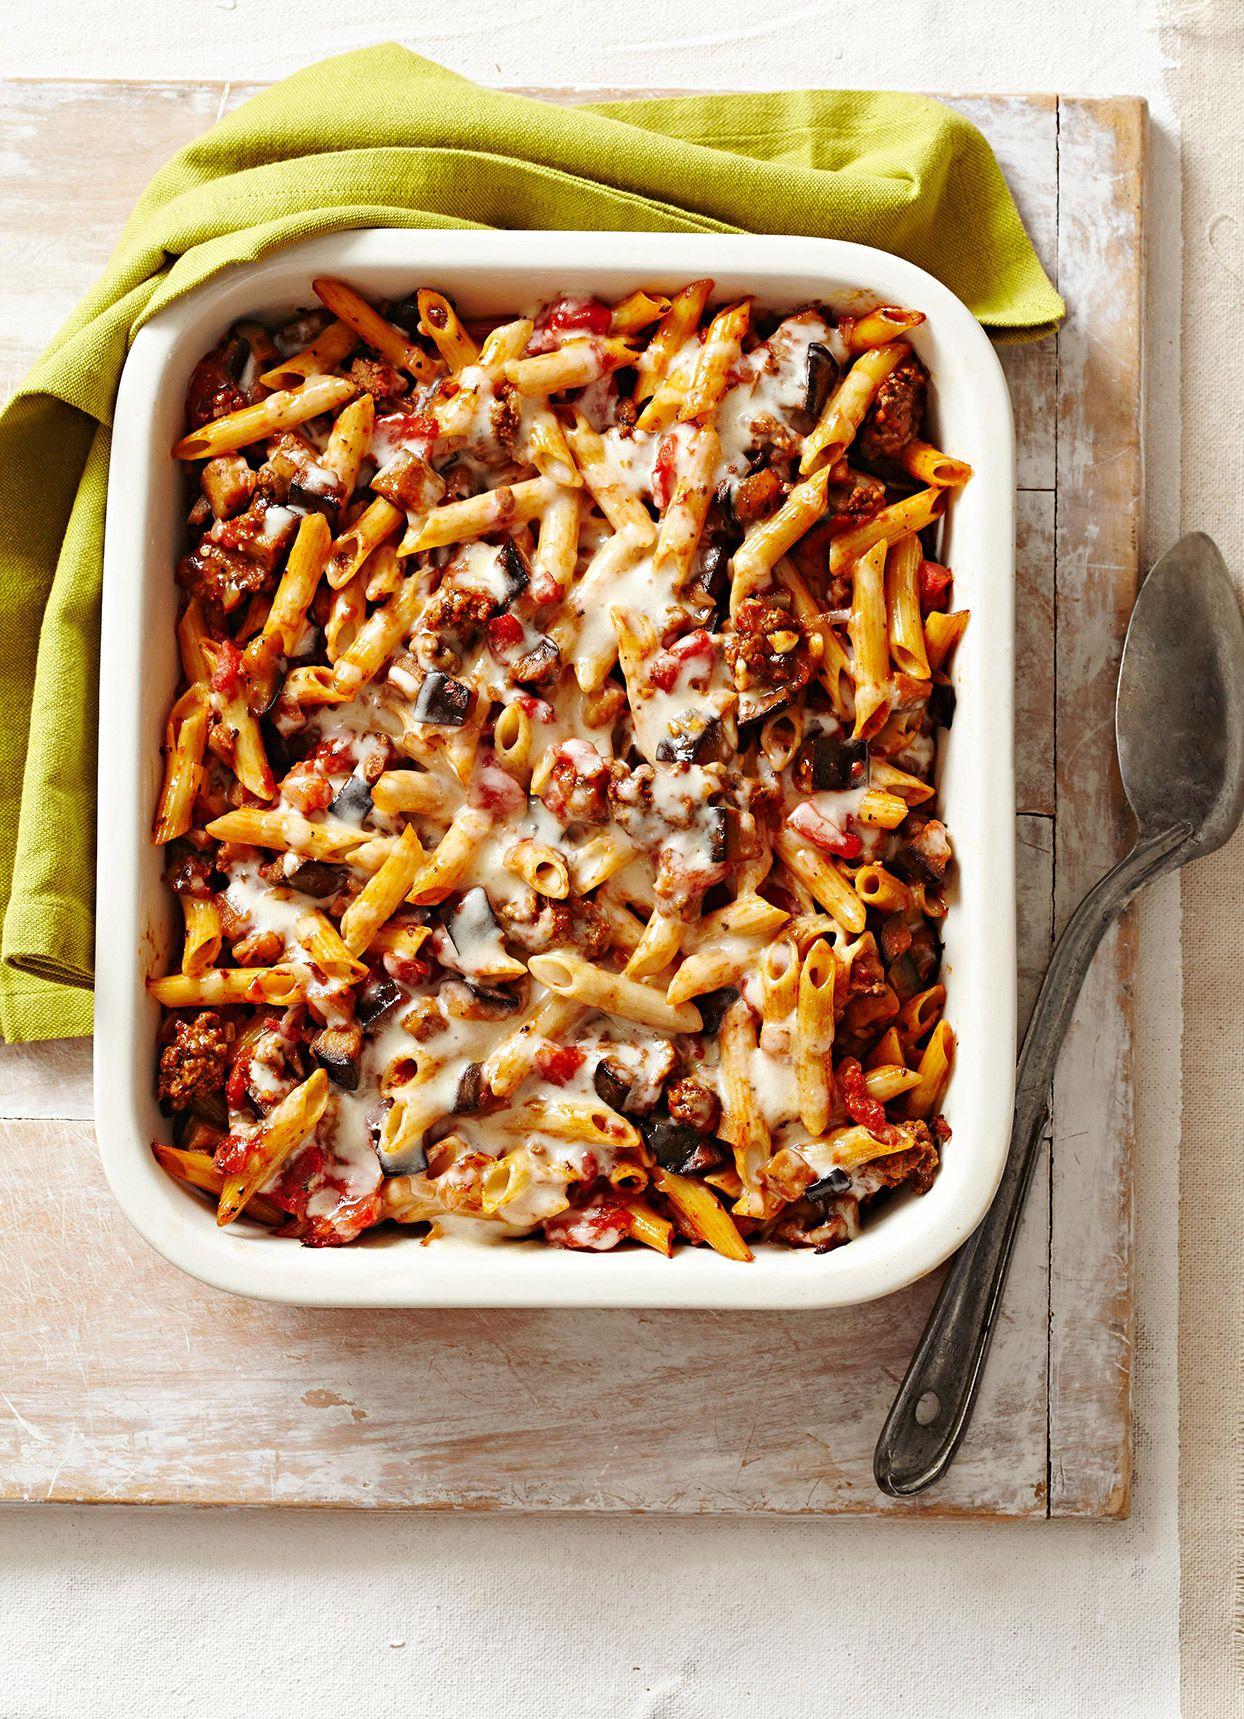 Eggplant Beef Pasta Bake Recipe In 2020 Ground Beef Recipes Healthy Healthy Ground Beef Beef Recipes